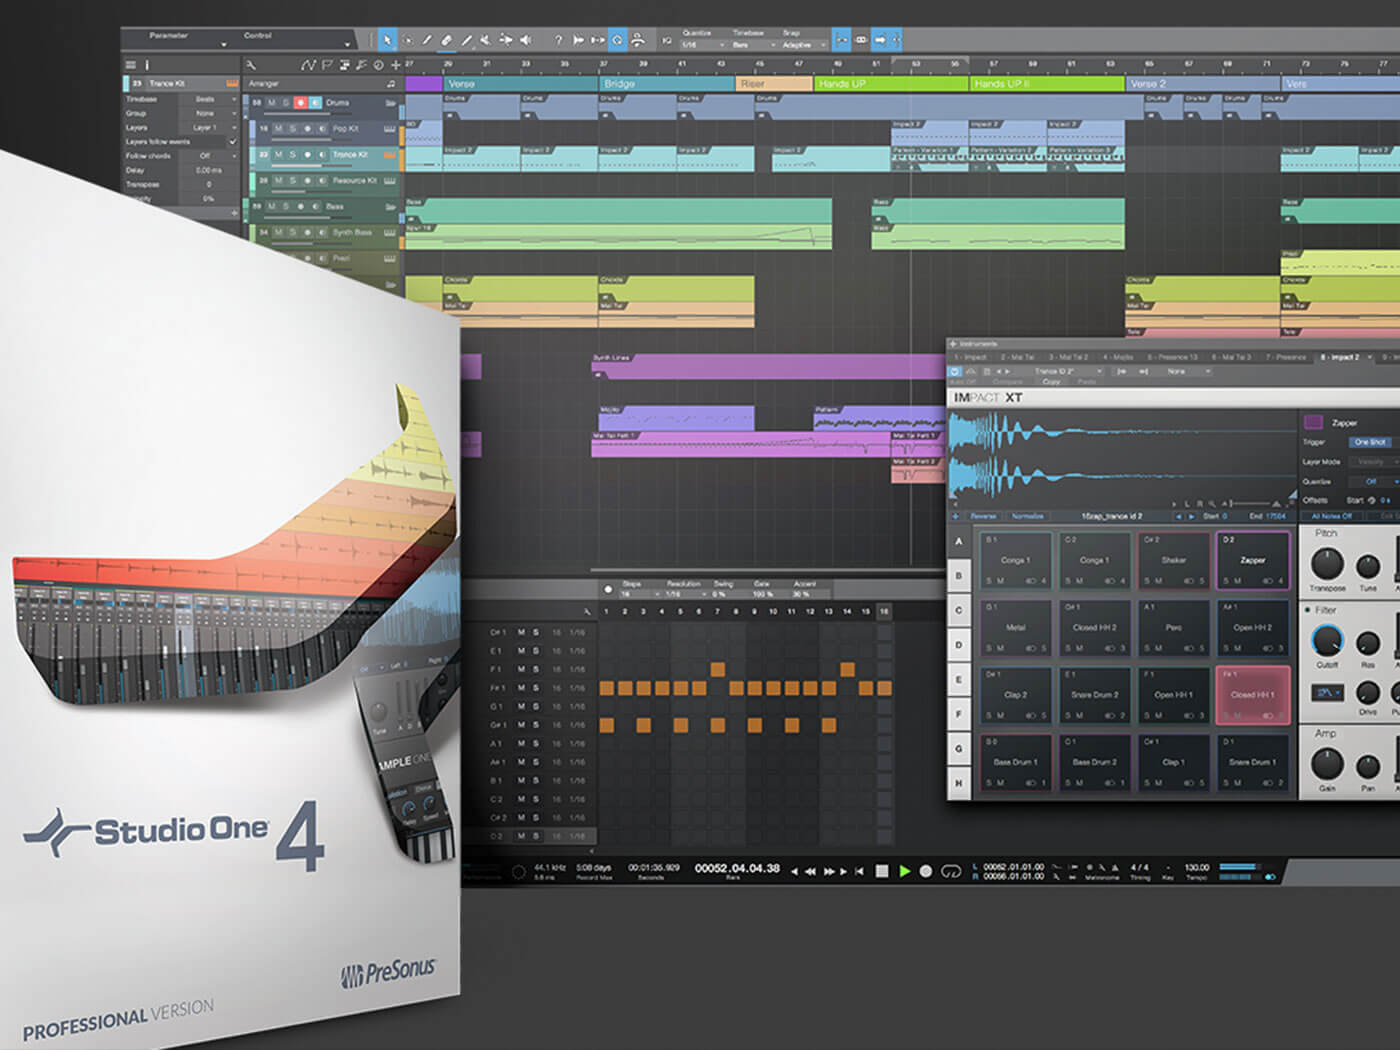 Pre Sonus' Studio One